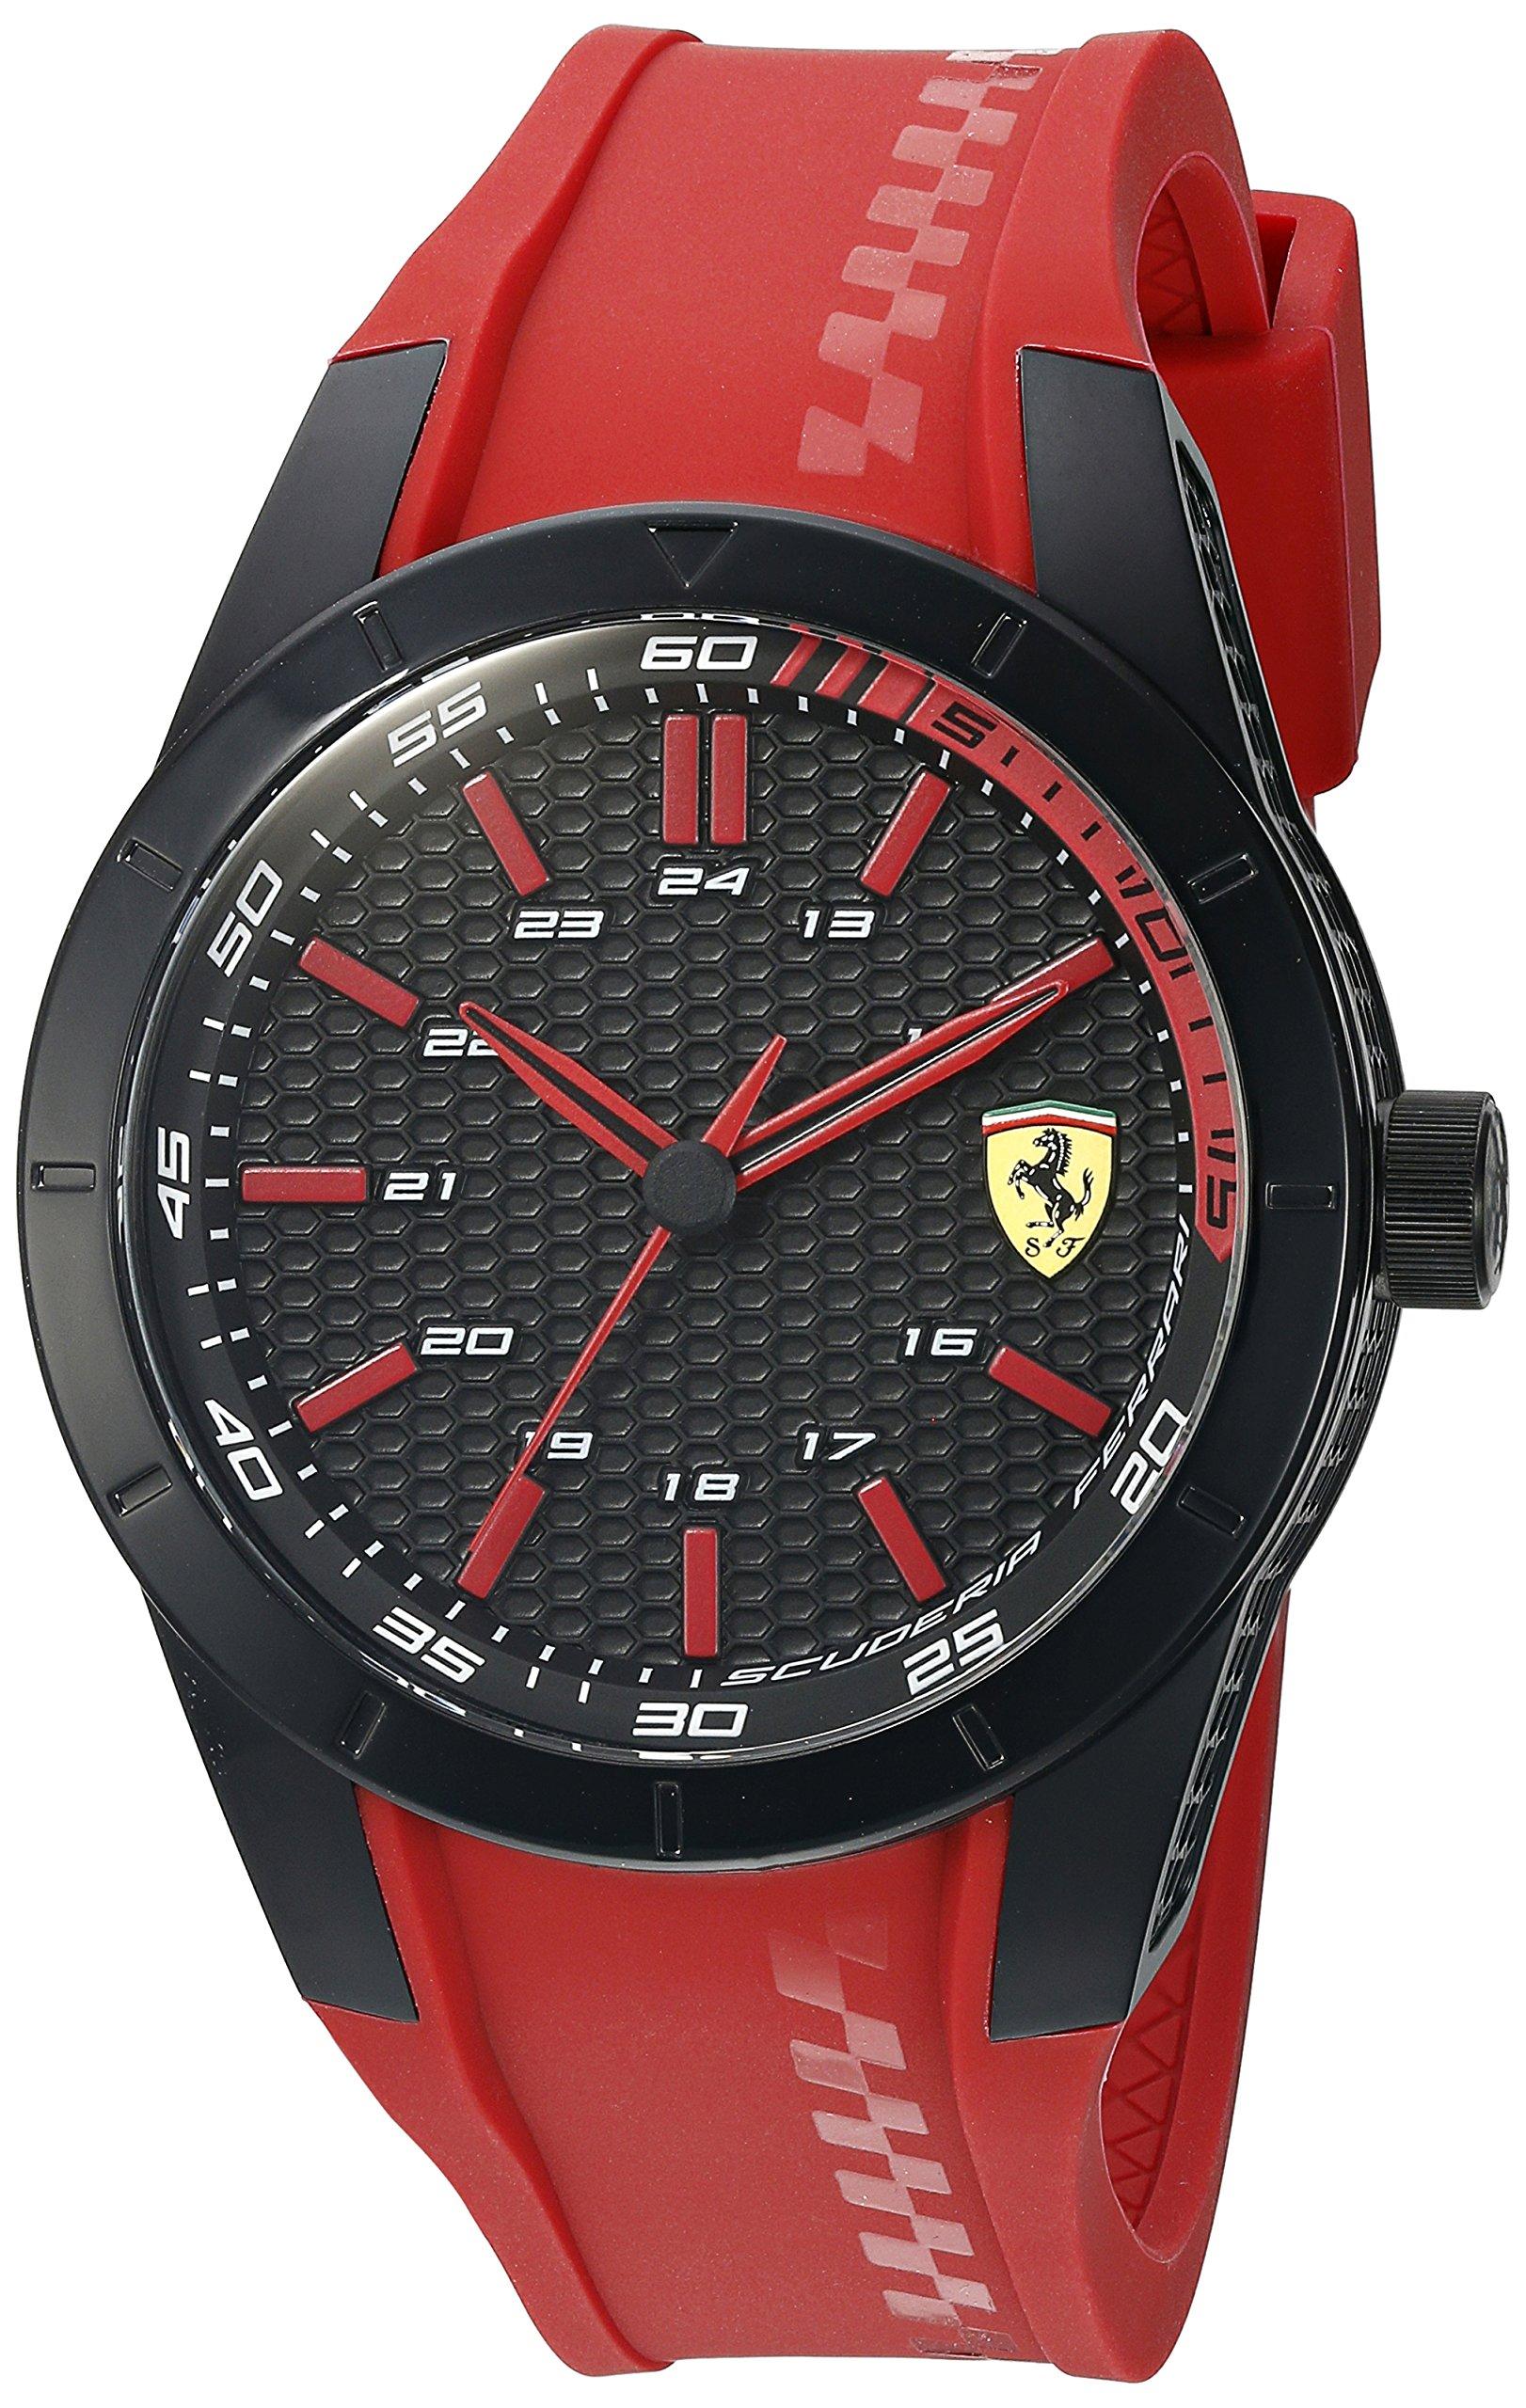 Ferrari 0830299 Ferrari Red Rev Black and Red Textured Dial Red Rubber Strap